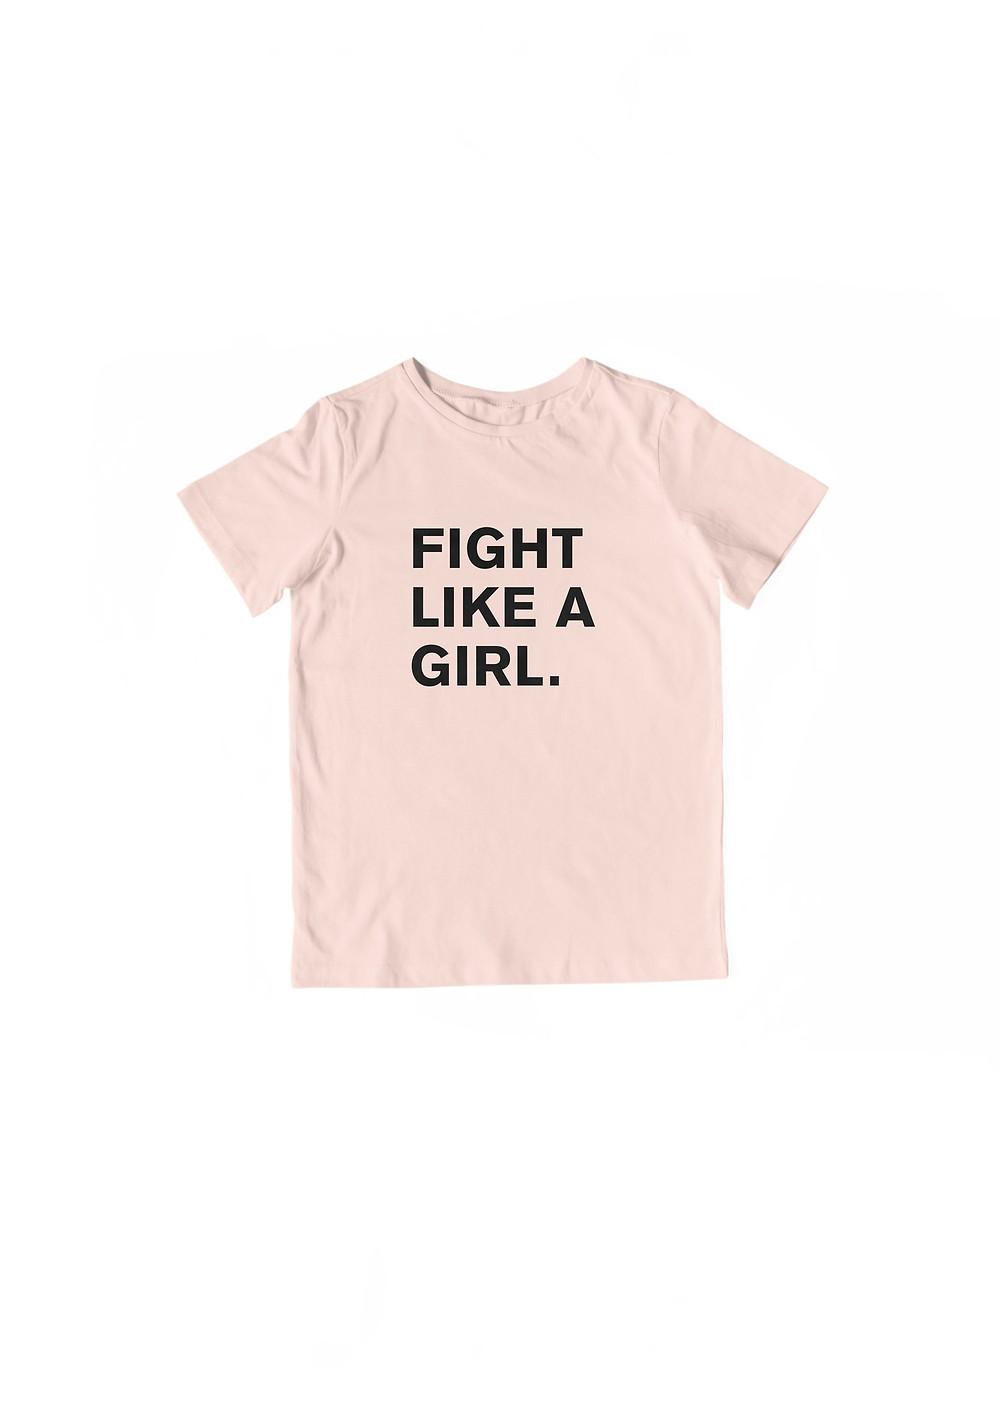 Eleven5_FightLikeAGirl_ShirtDesign_Kid_Pink